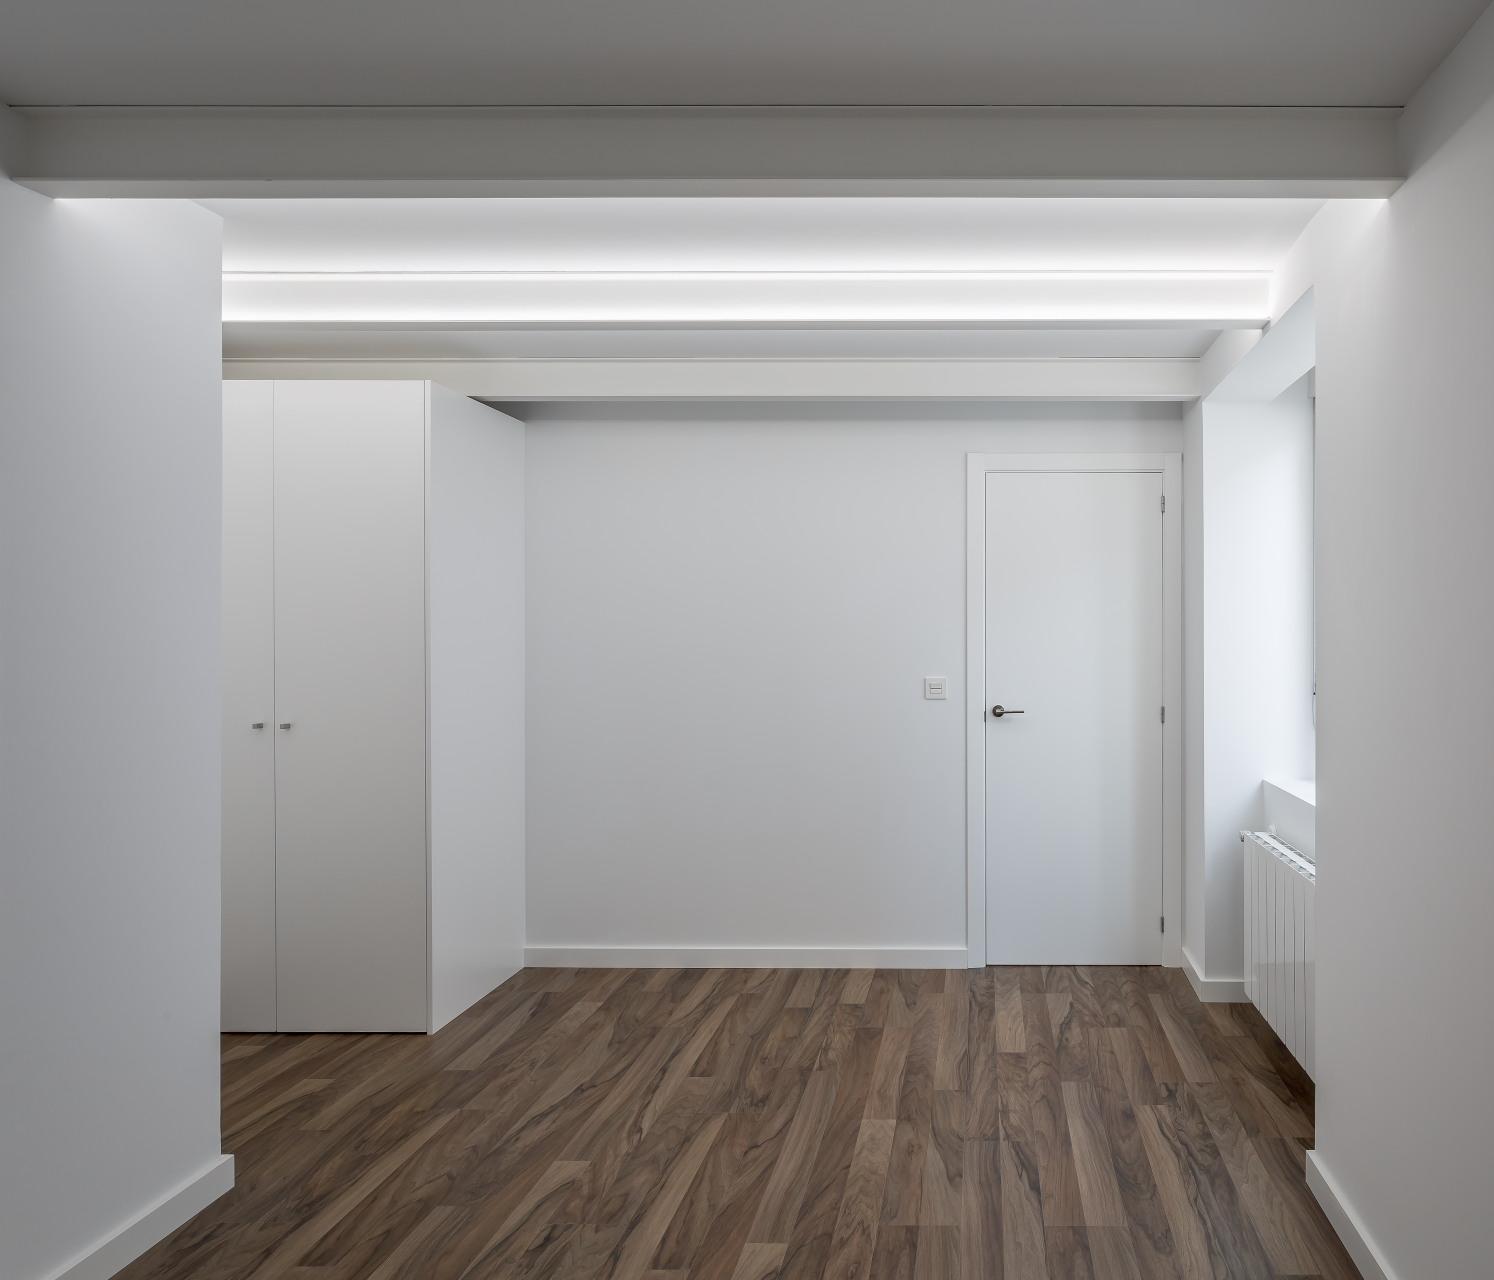 fotografia-arquitectura-valencia-german-cabo-viraje-rehabilitacion-campanar (30)